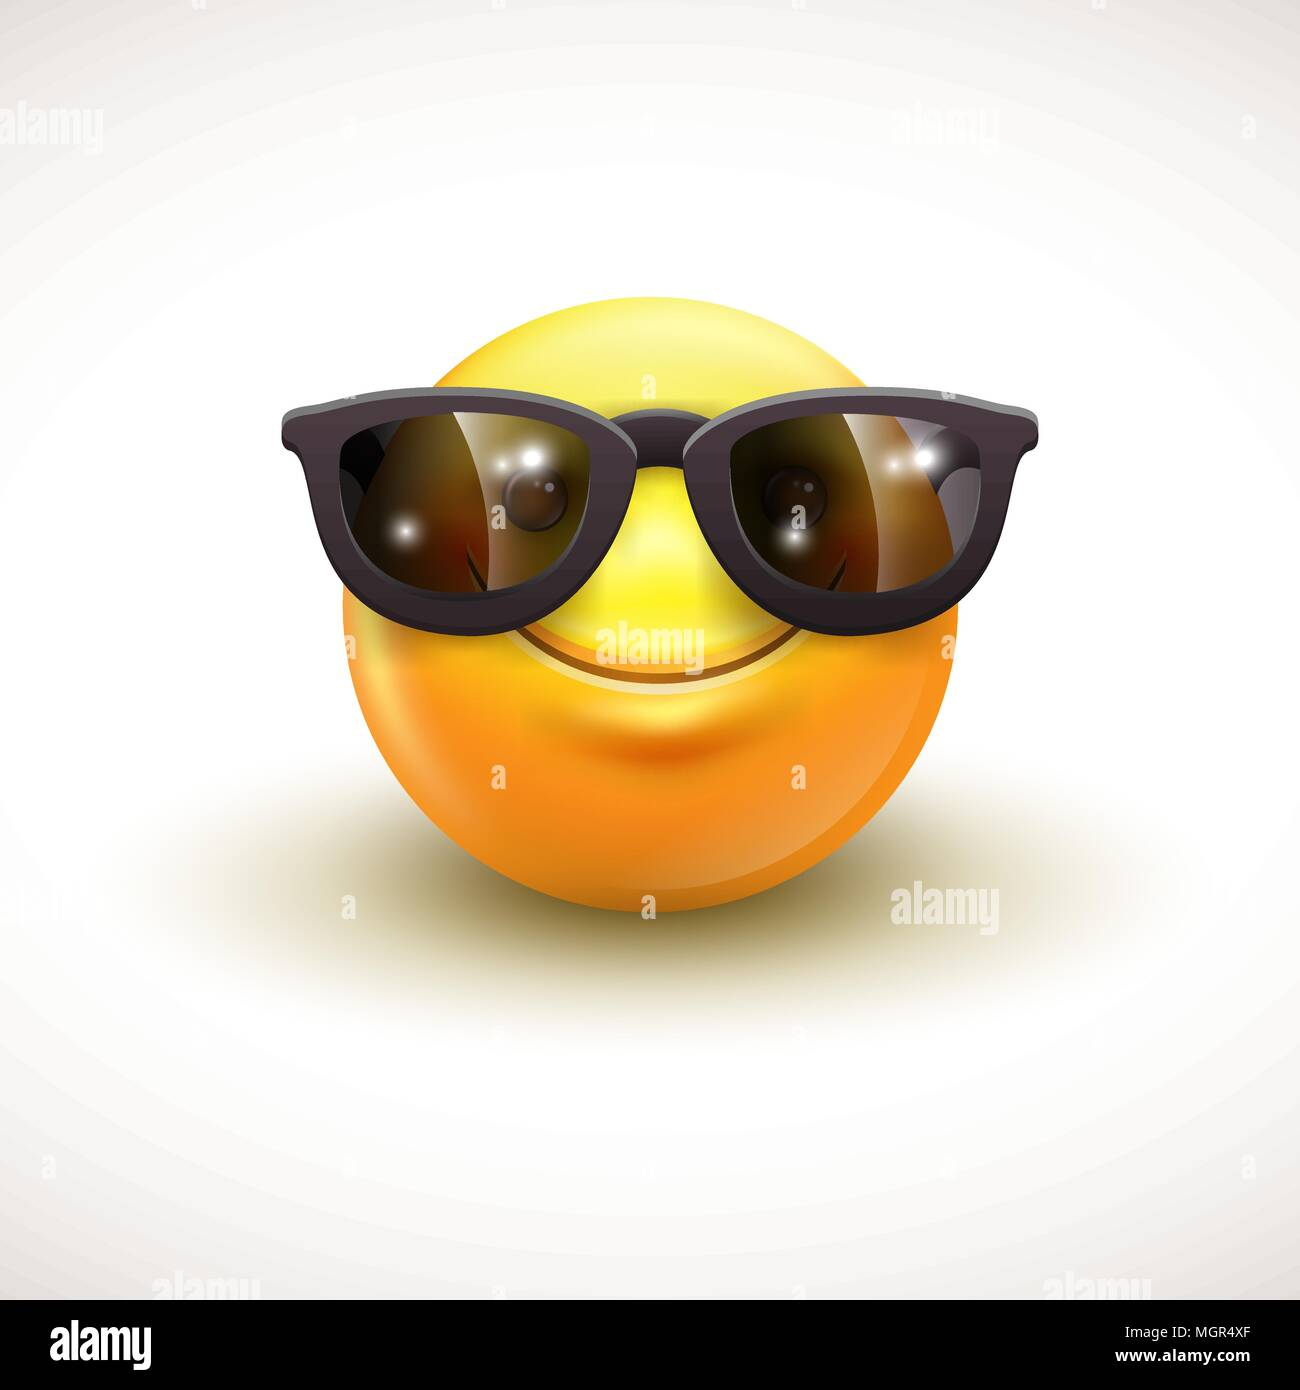 Cute smiling emoticon wearing black sunglasses, emoji, smiley - vector illustration - Stock Image